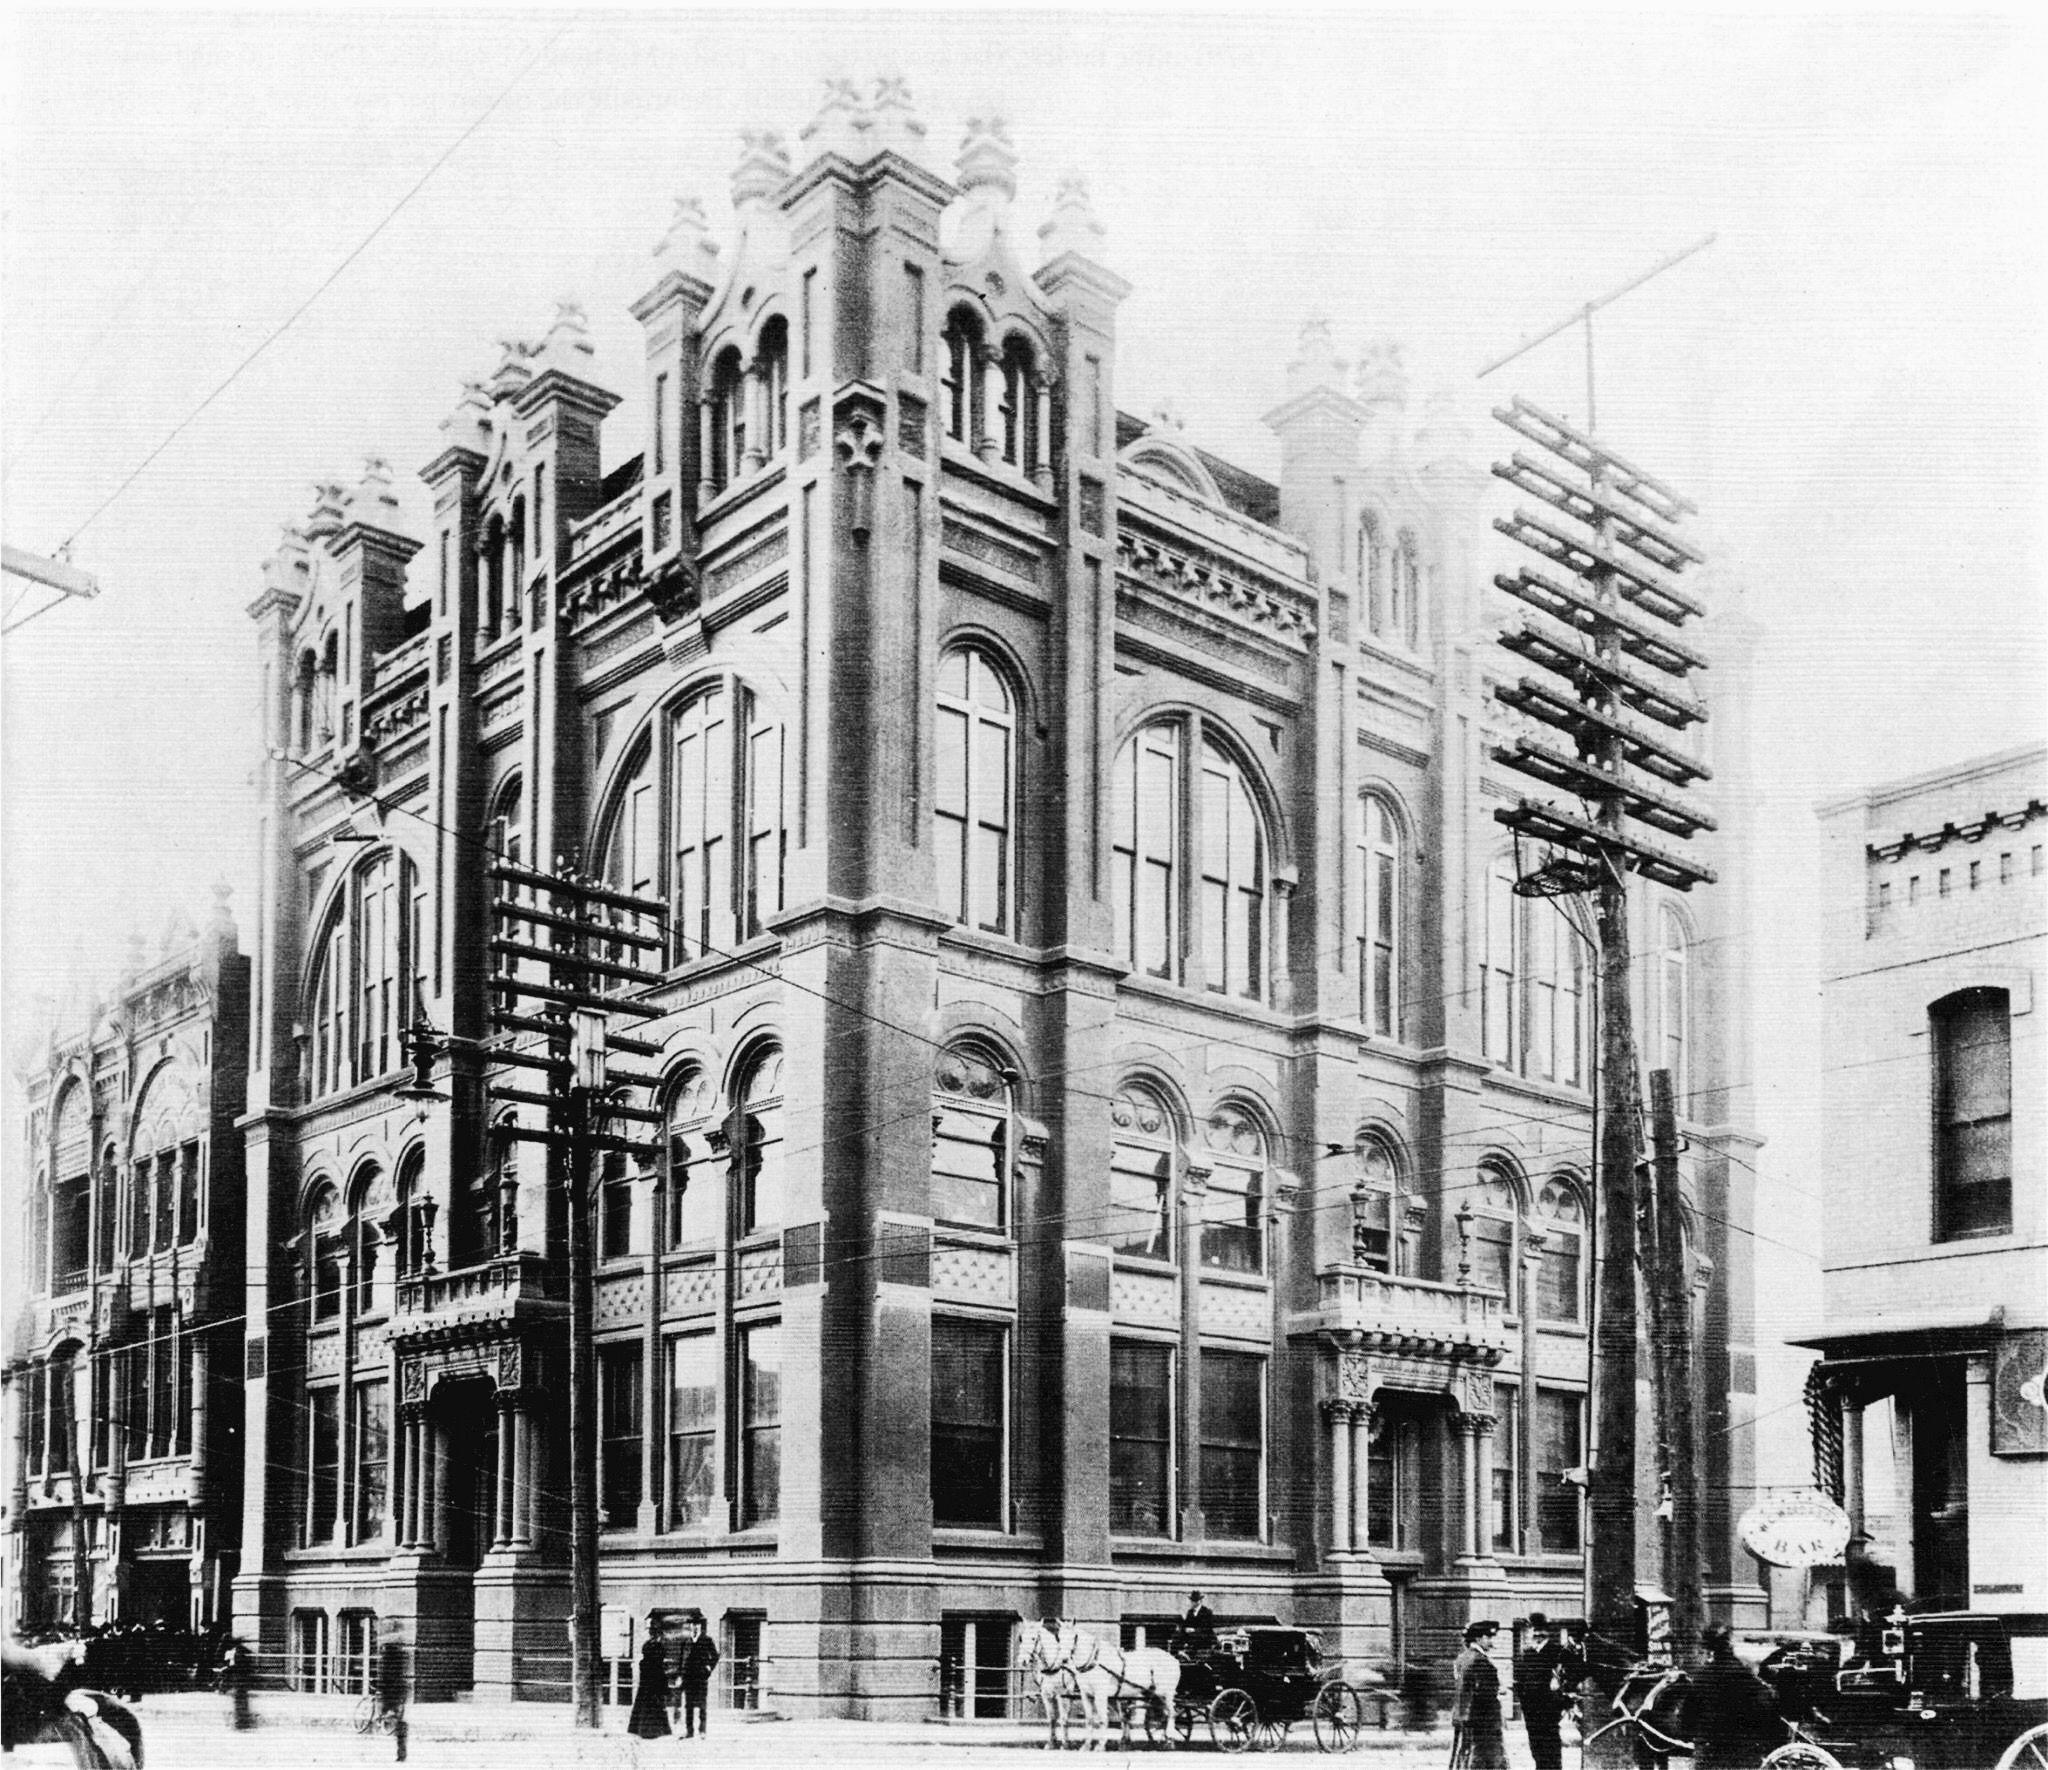 Dallas City Hall was a turnofthecentury architectural